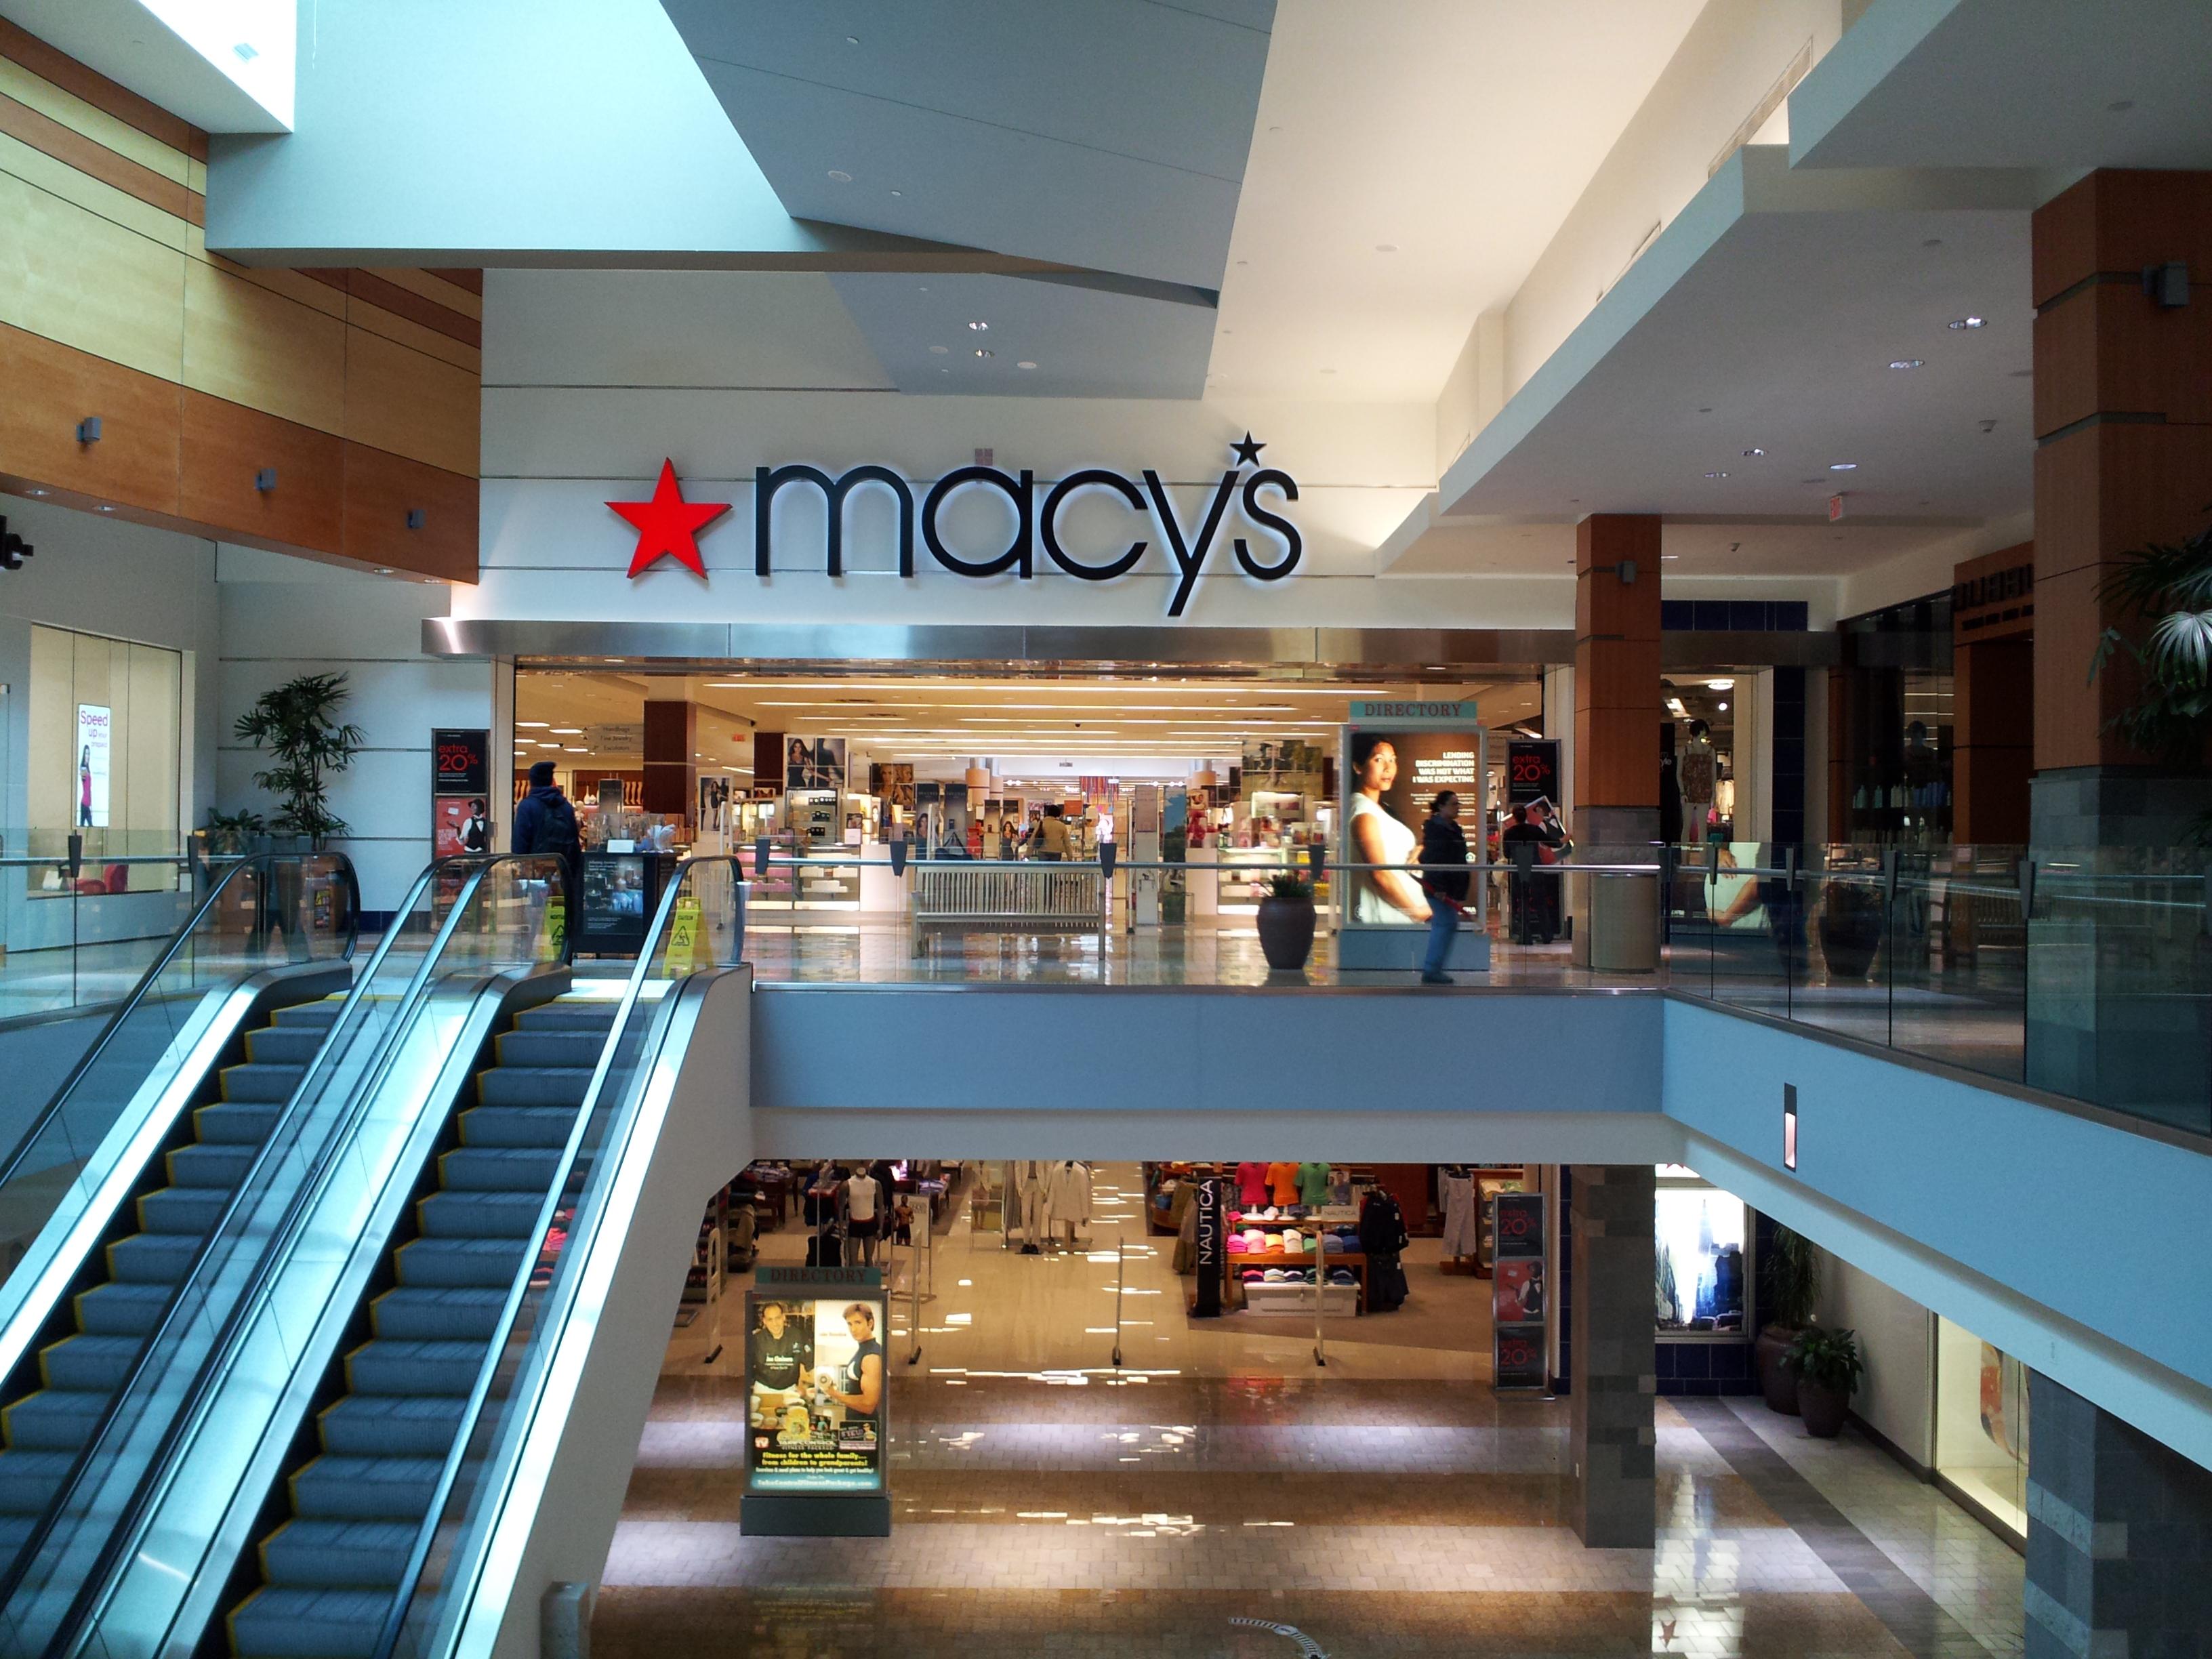 FileWestfield Wheaton Macys from mall interior upper